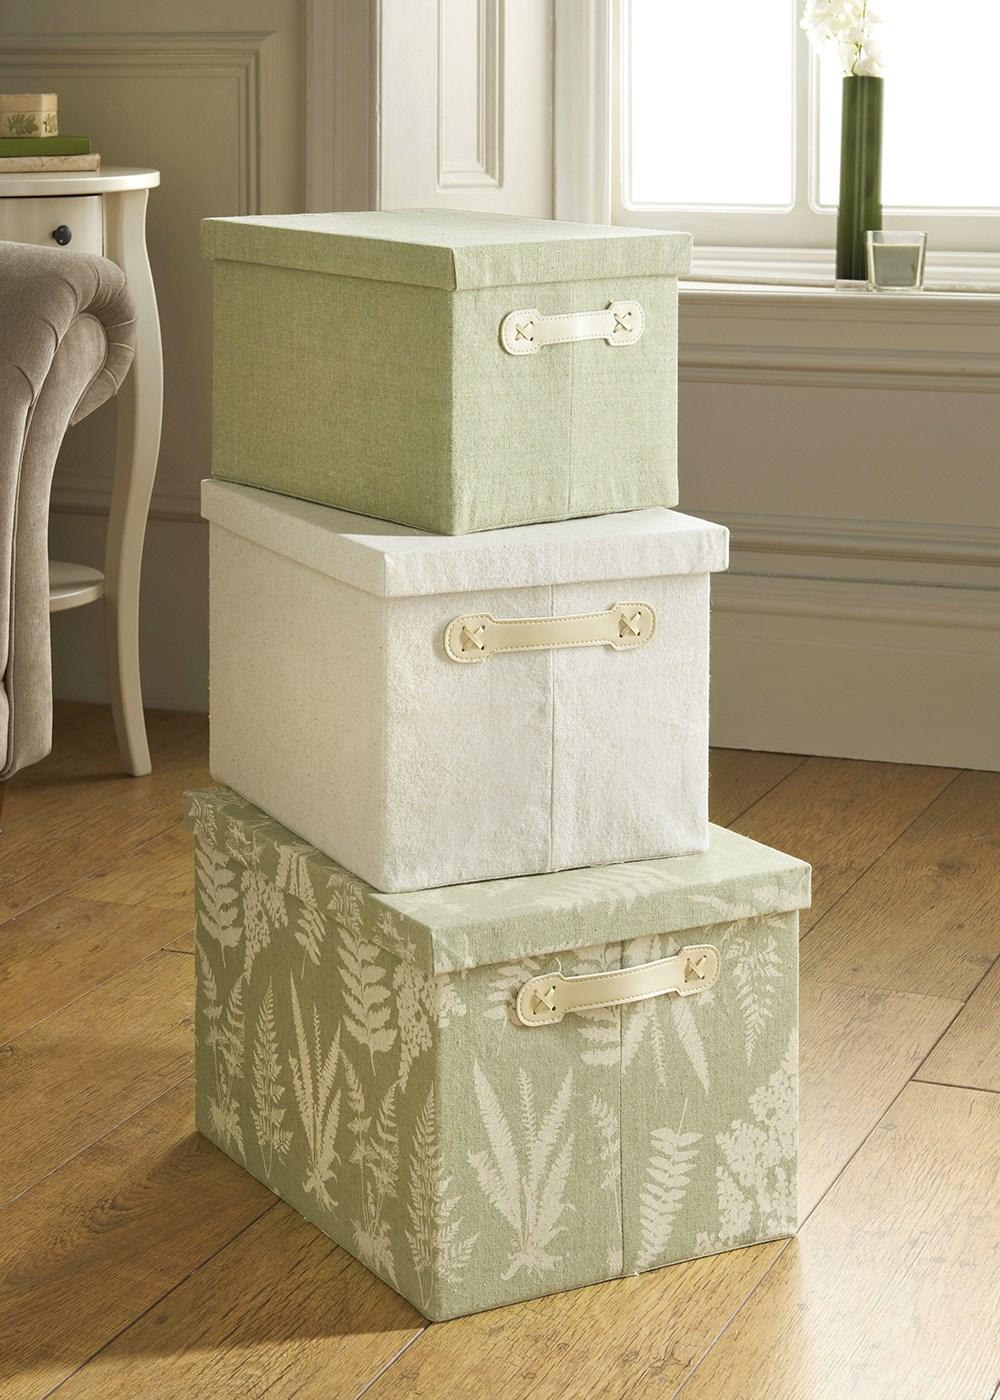 set-of-3-printed-storage-boxes-assorted-sizes- & boxes | KateKiwii